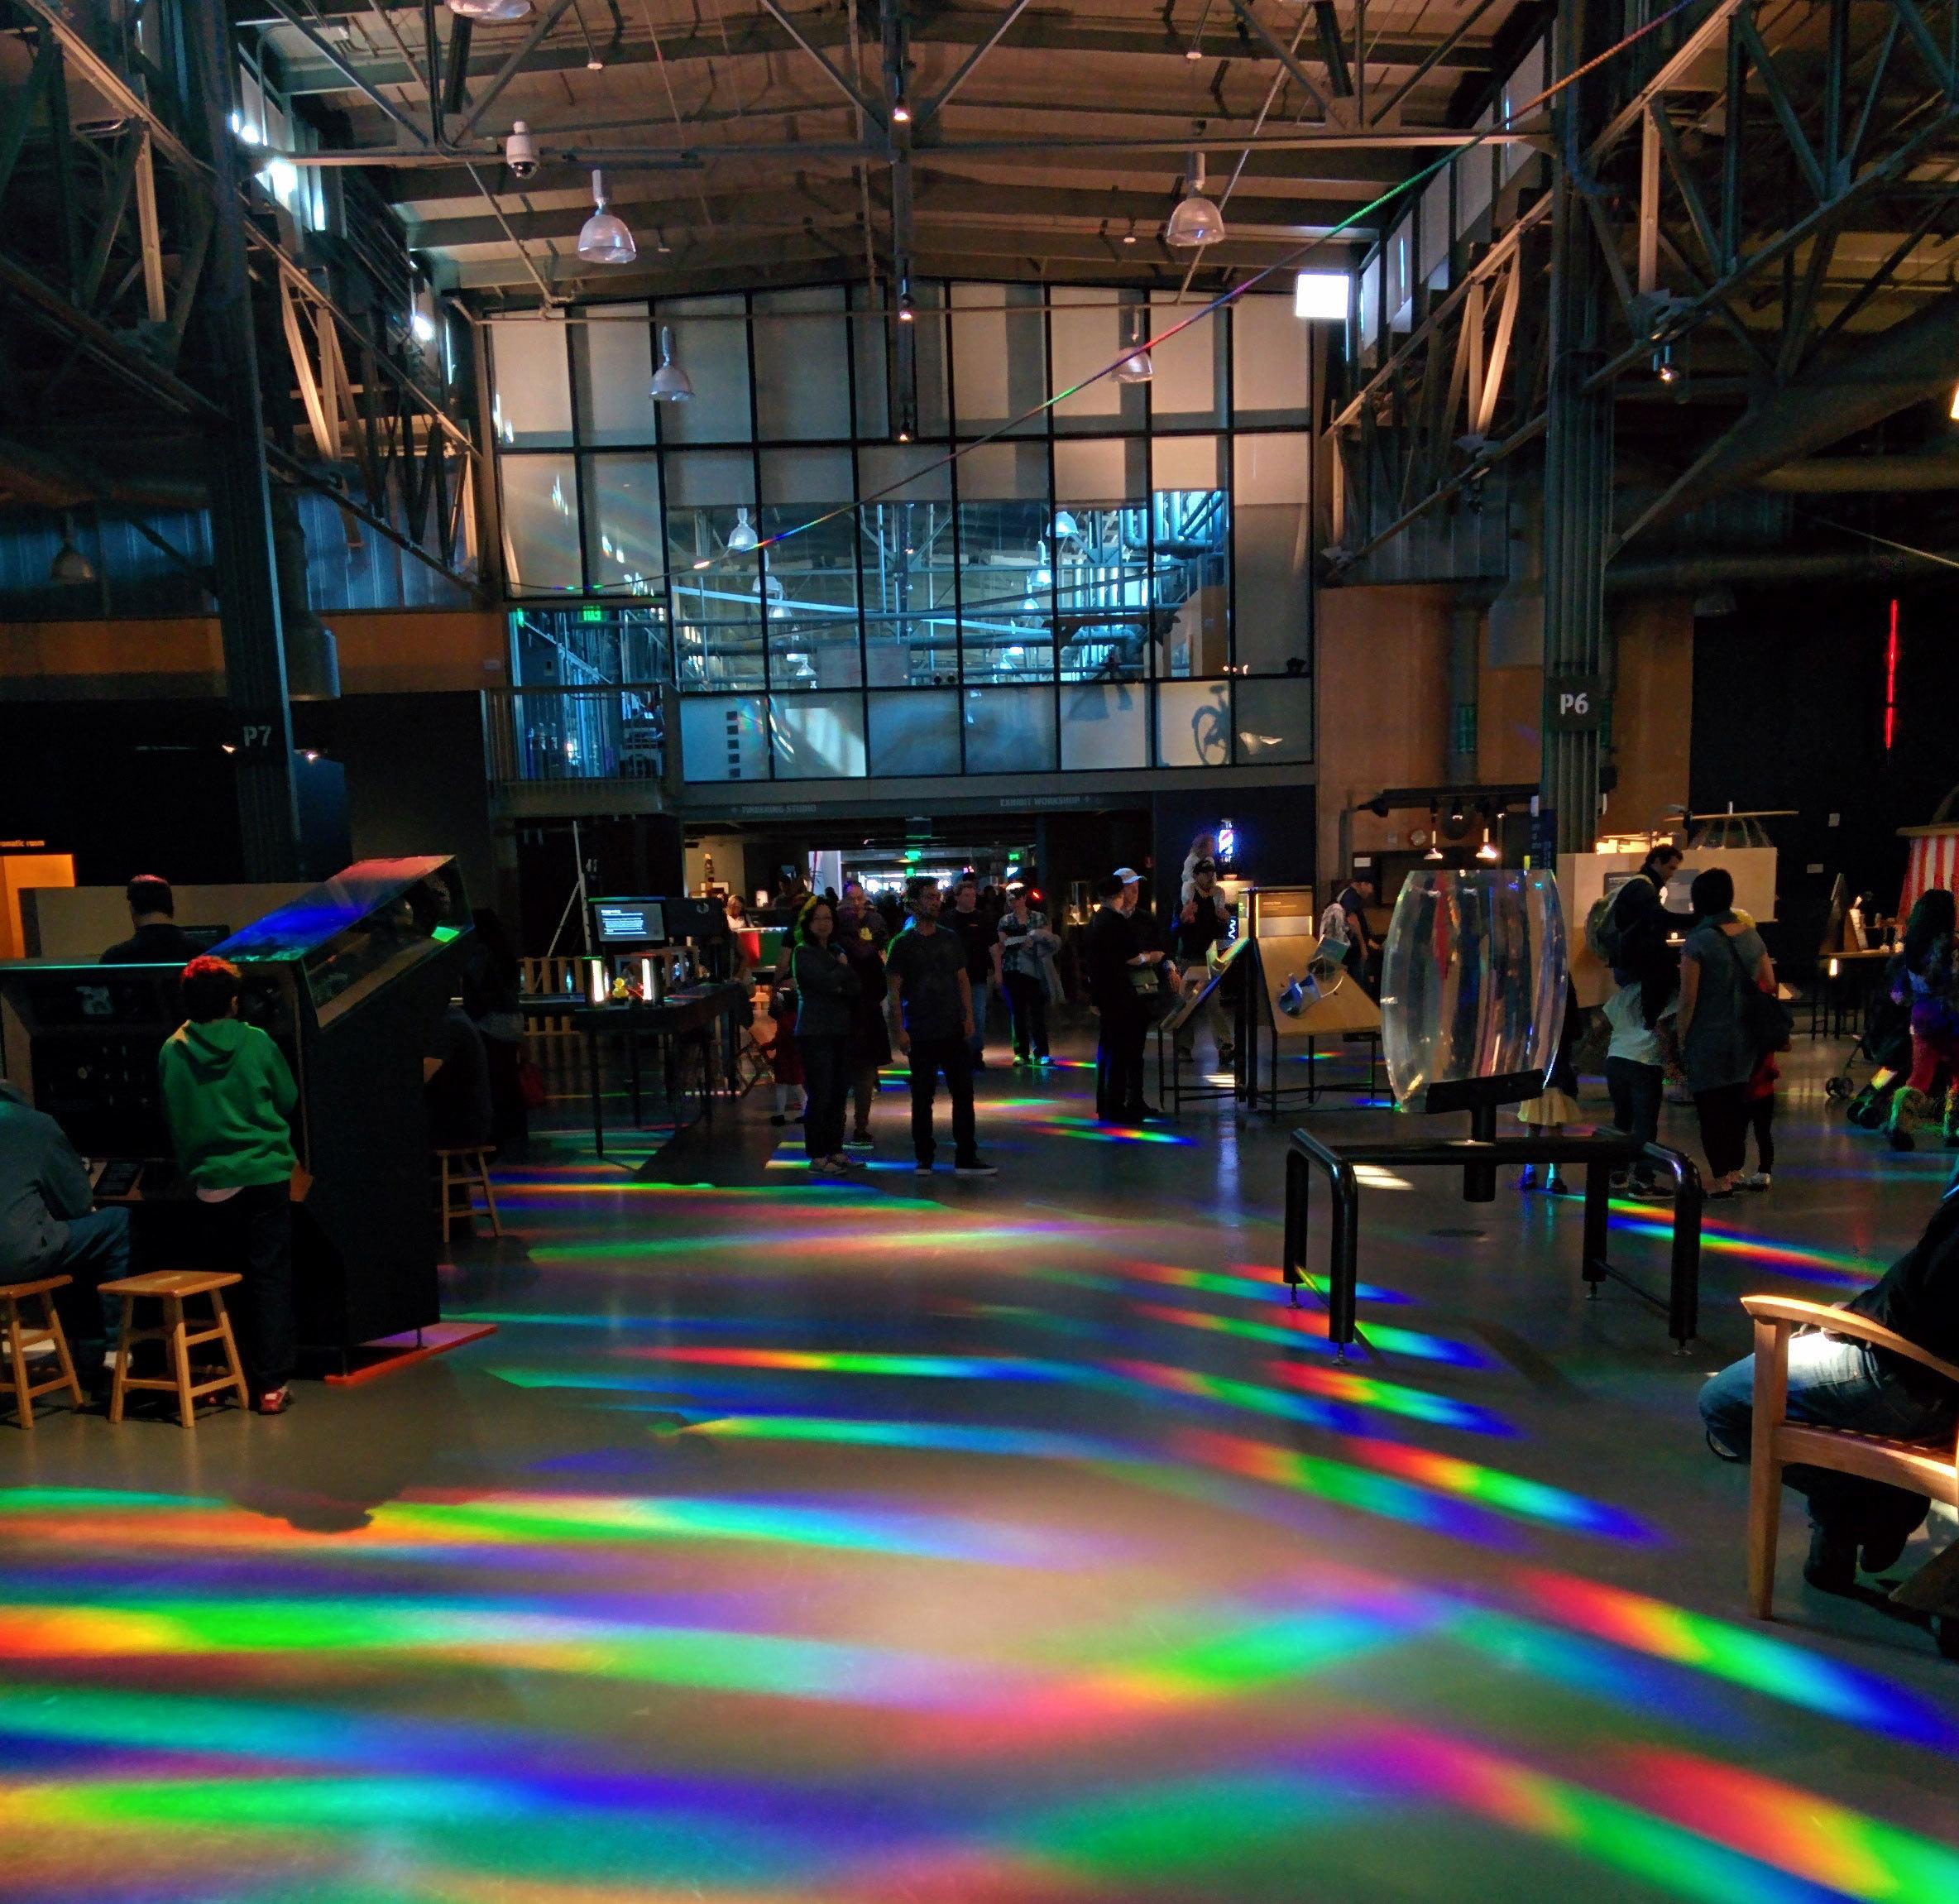 The Central Corridor of the new Exploratorium